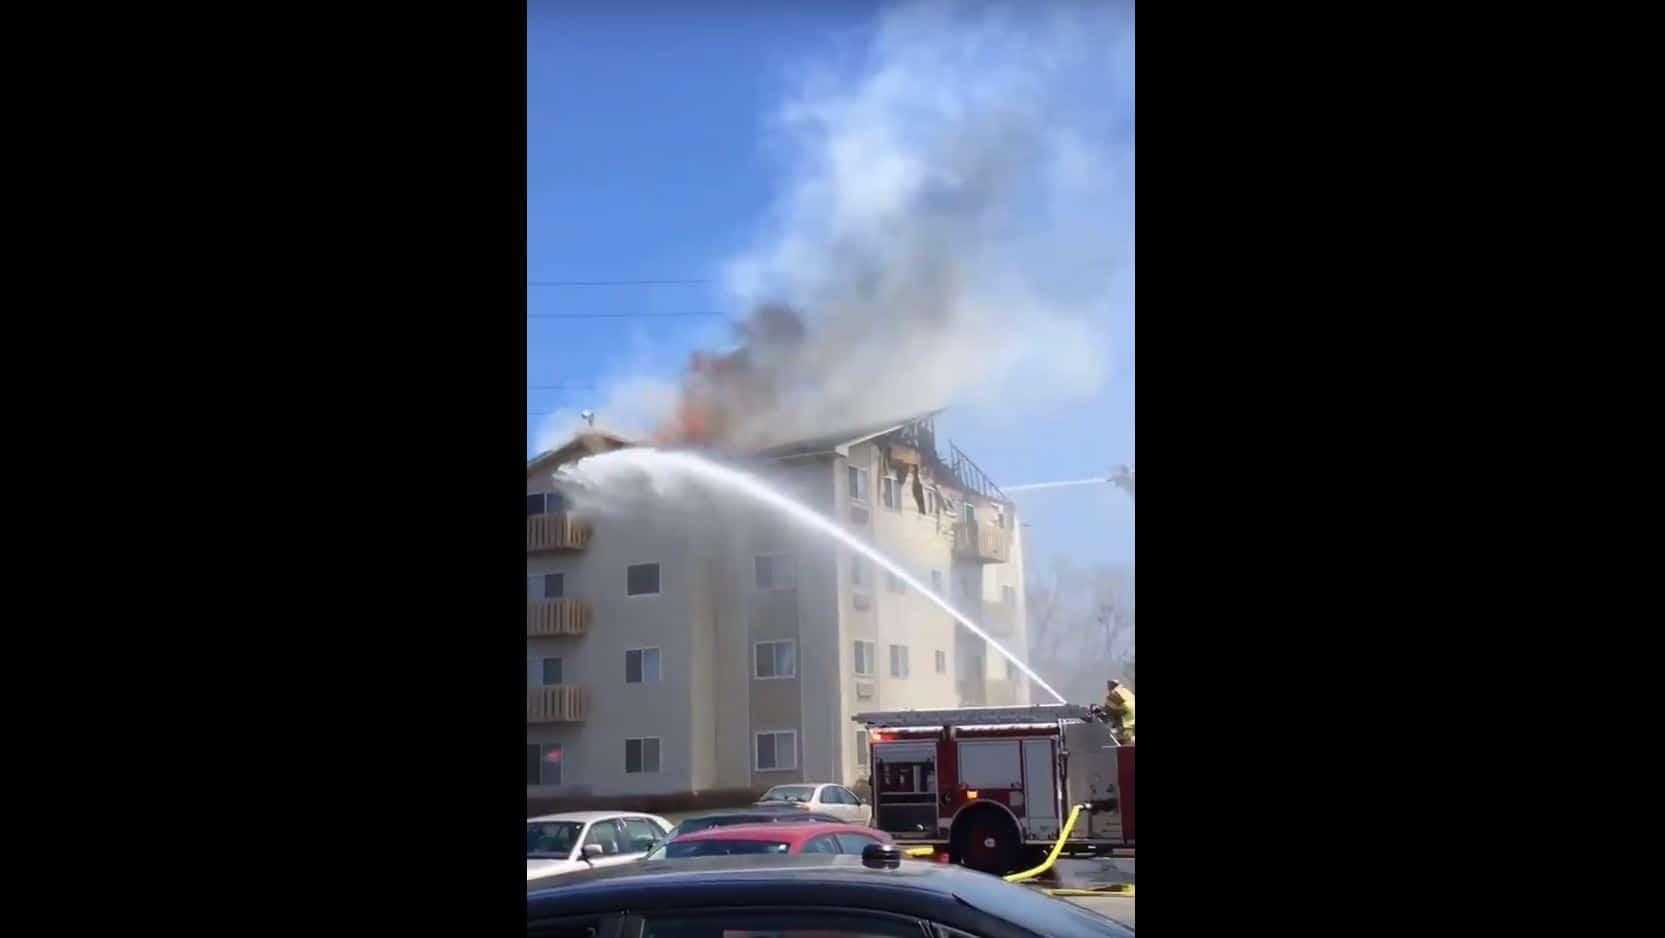 3 Alarm Fire Rips Through Waukegan Apartment Building